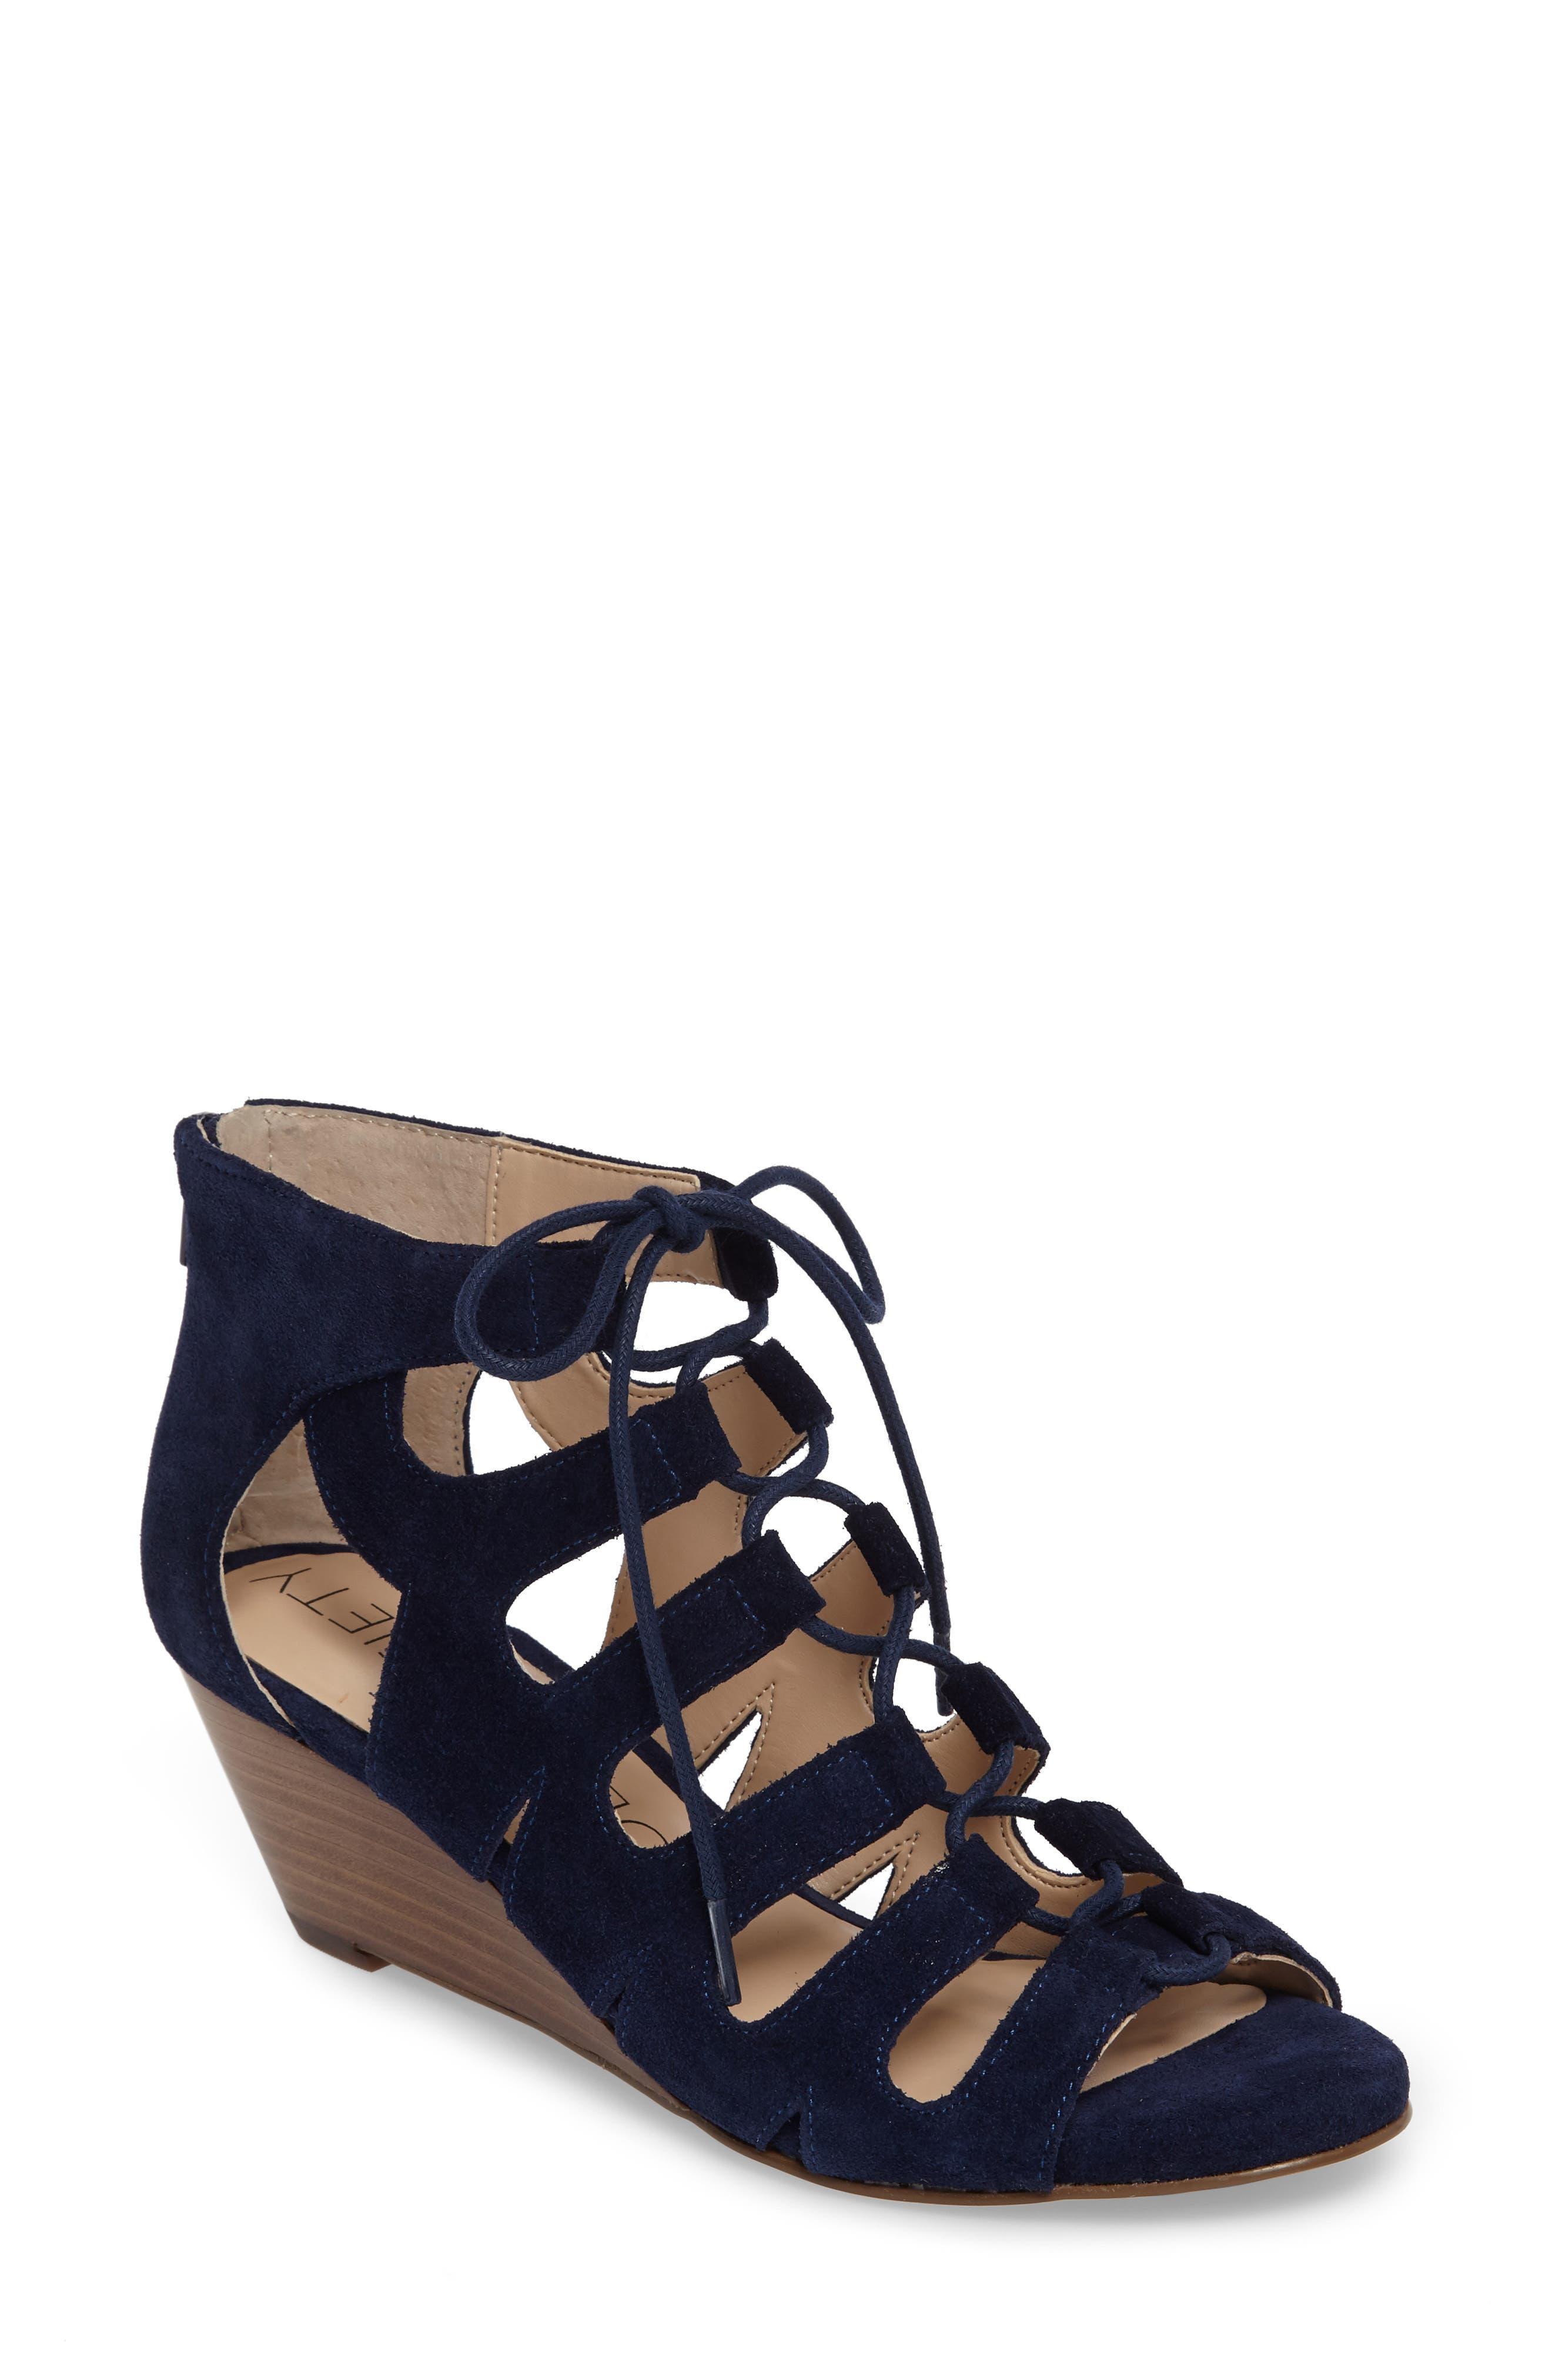 'Freyaa' Wedge Sandal,                             Main thumbnail 1, color,                             Navy Suede